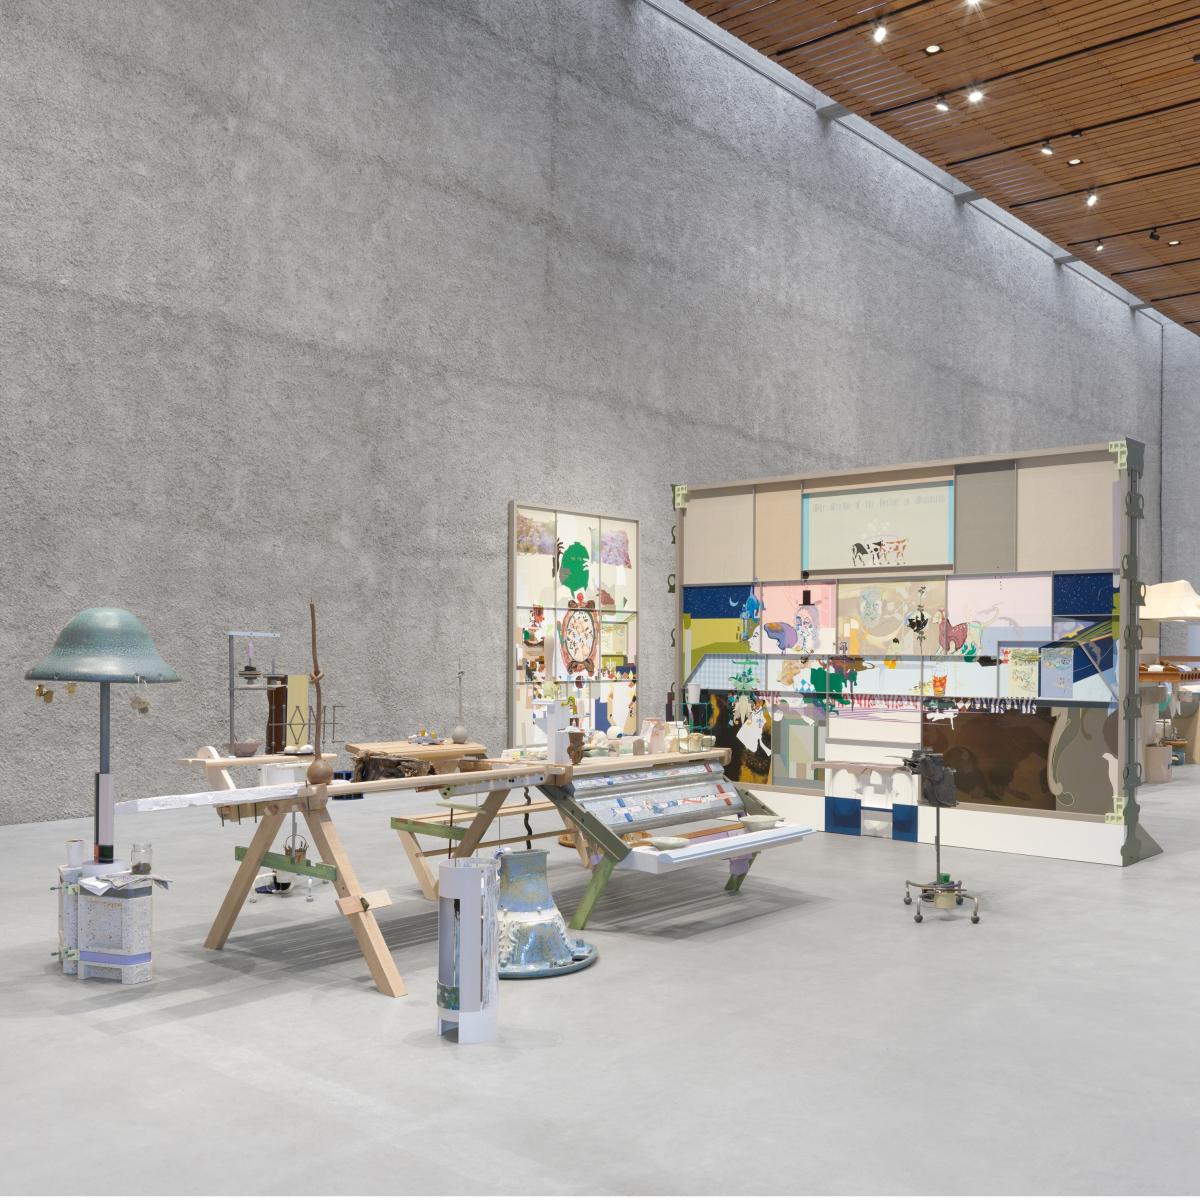 König Gallery Helene Marten